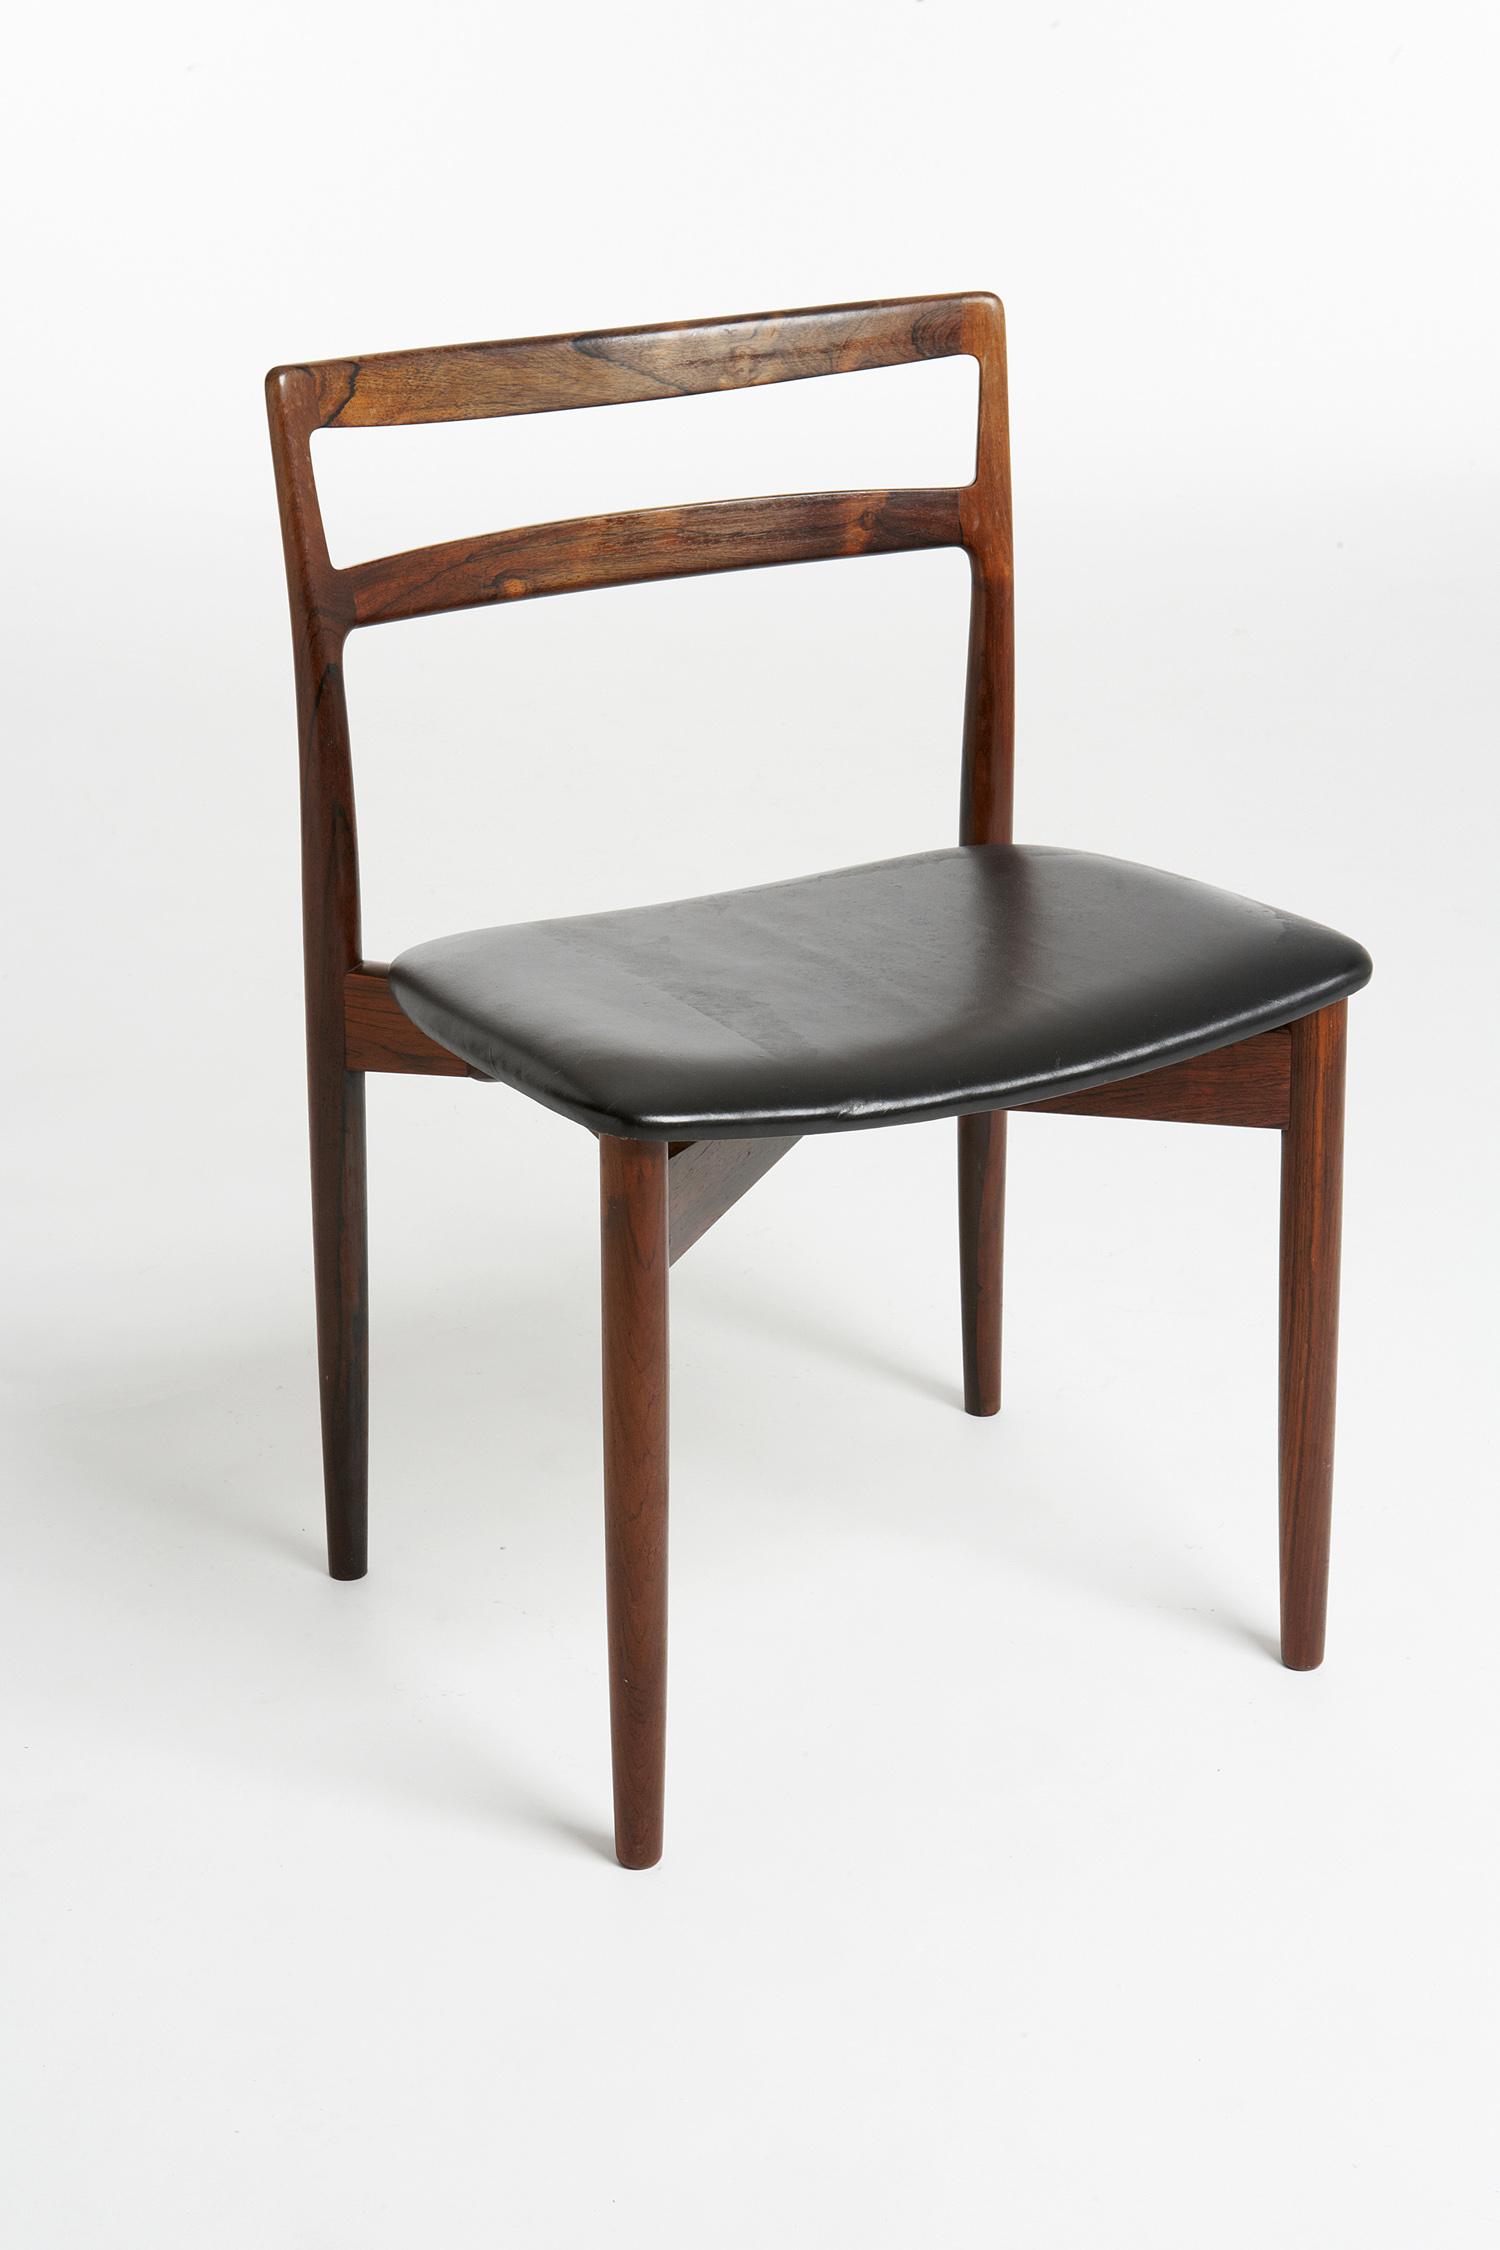 H Ostergaard 1960 Dining Chair   • made 1960-69    •